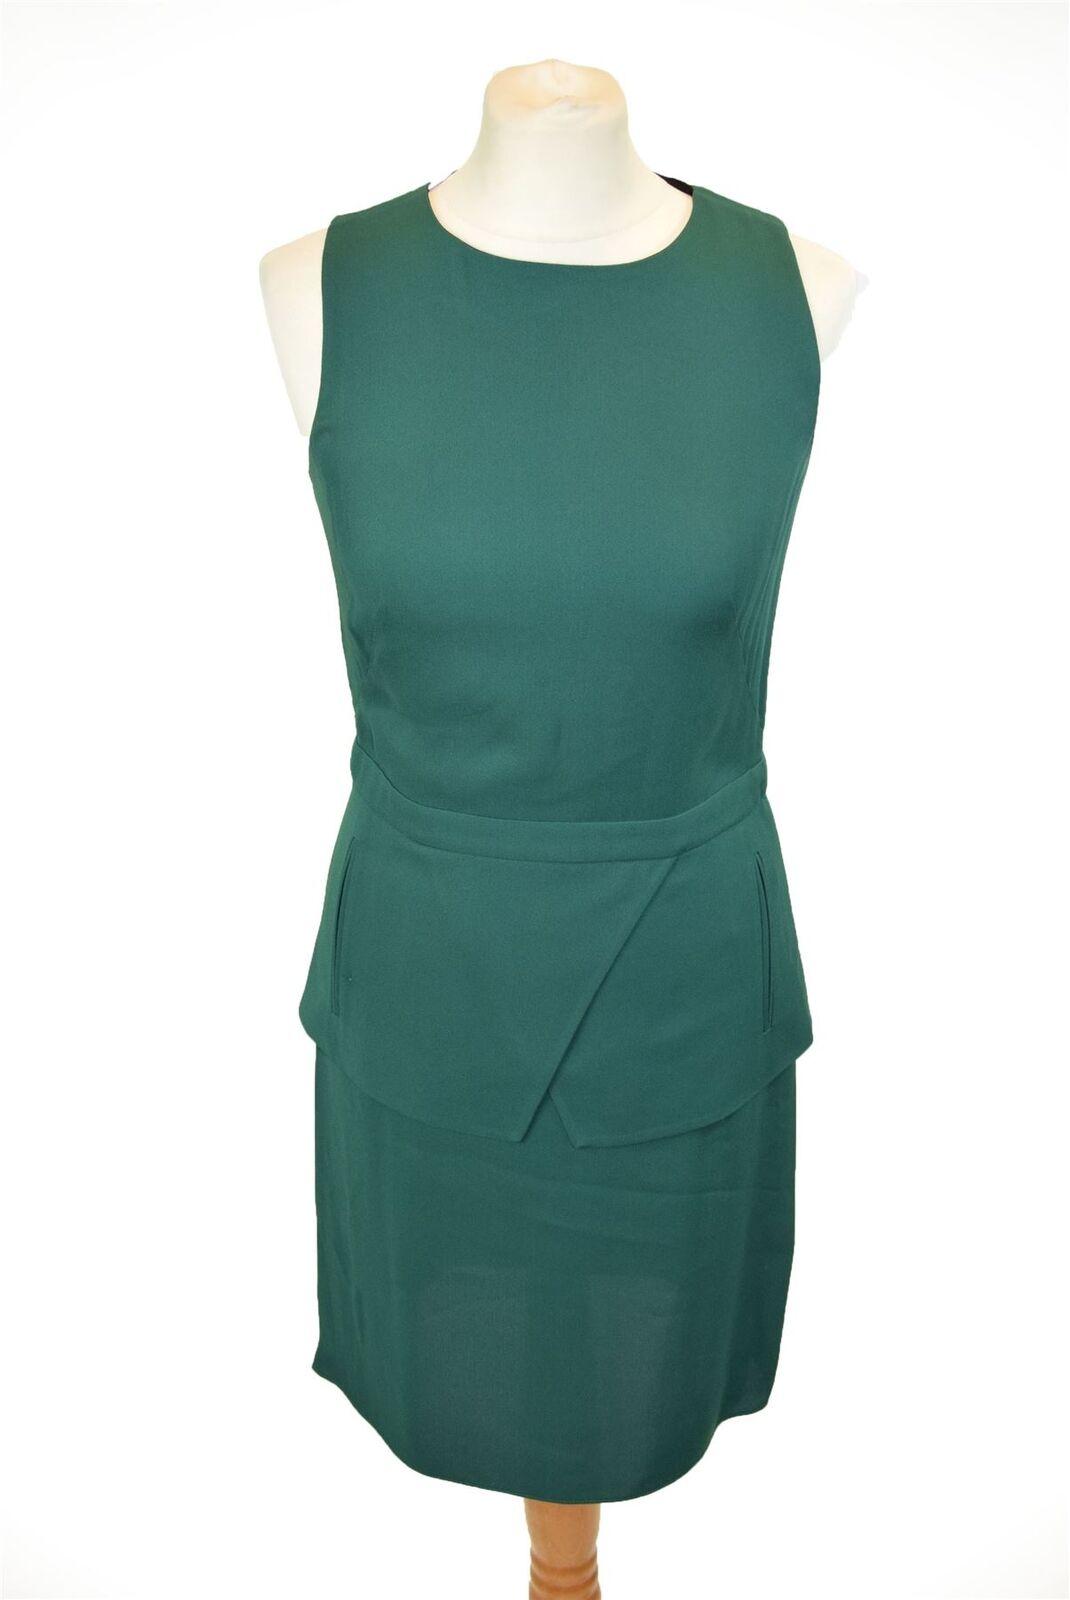 TIBI Green Crepe Peplum Dress, US 4